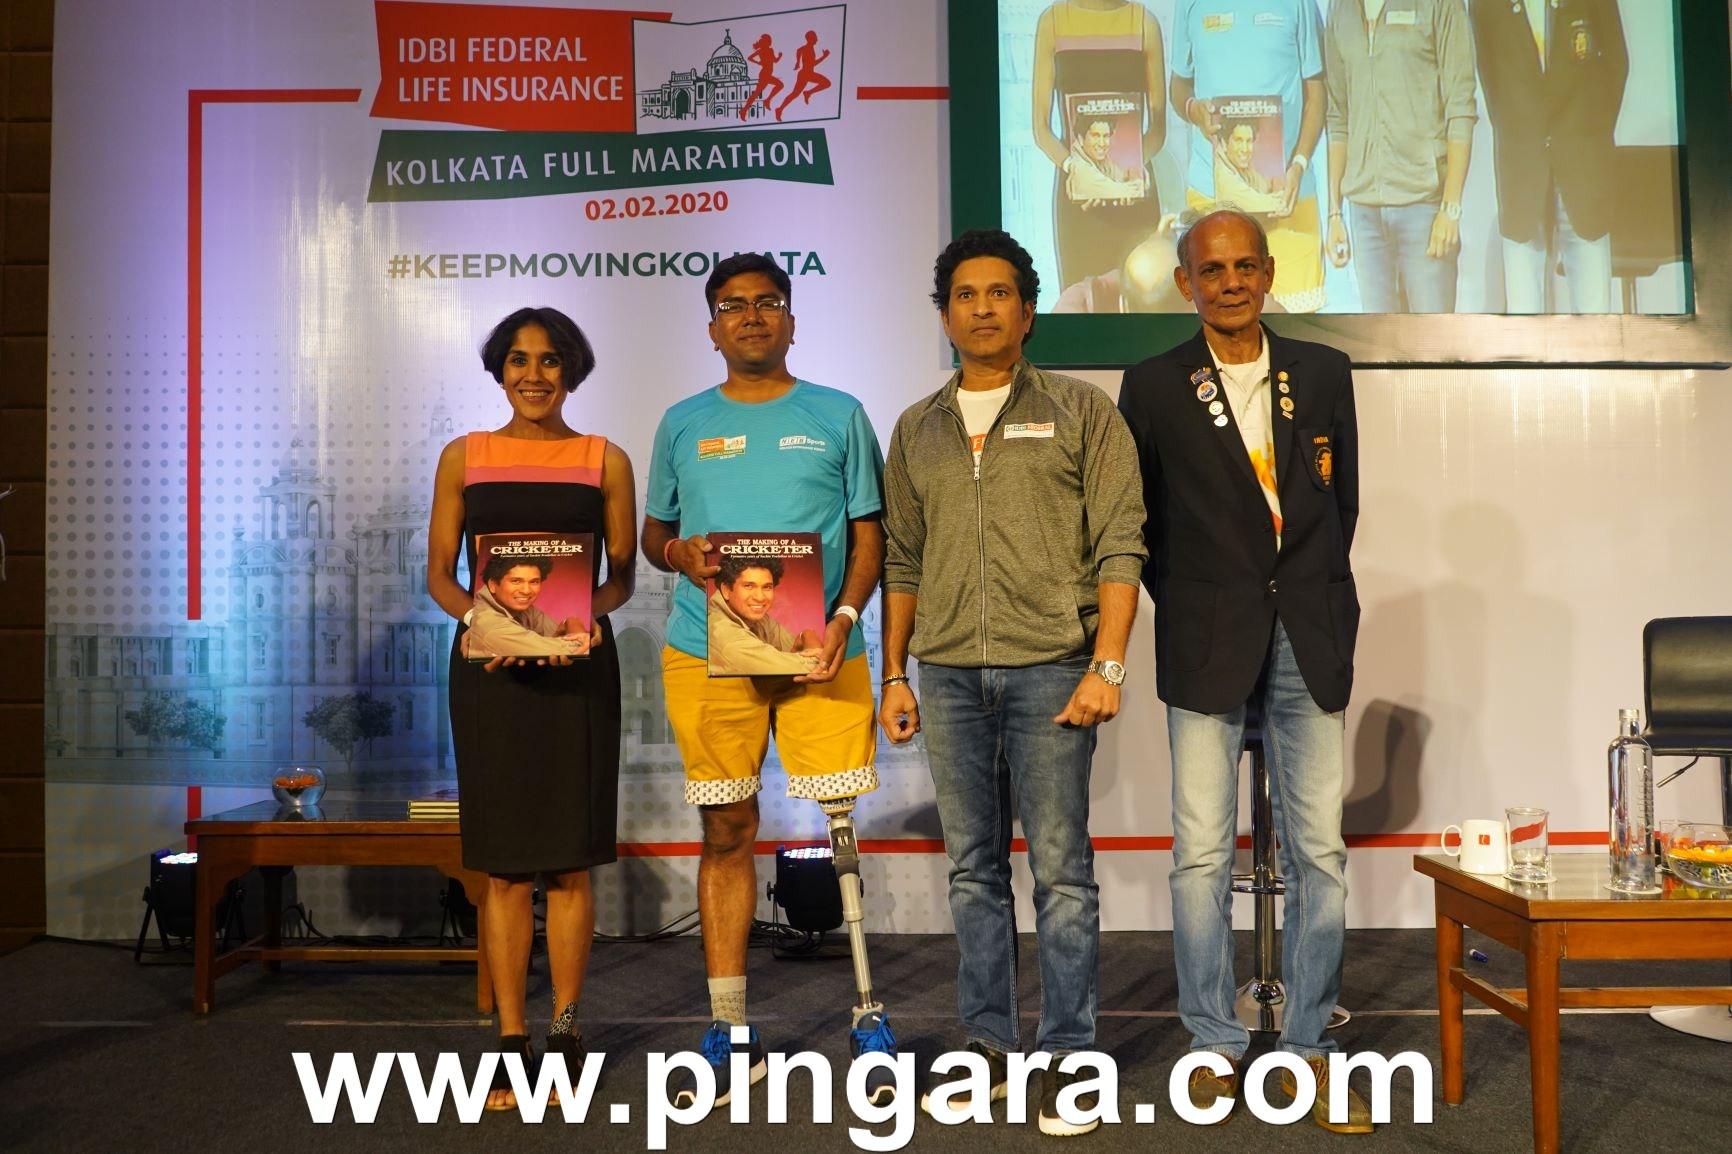 Kolkata: Anubhav, Anjali start as favourites at the IDBI Federal Life Insurance Kolkata Full Marathon 2020